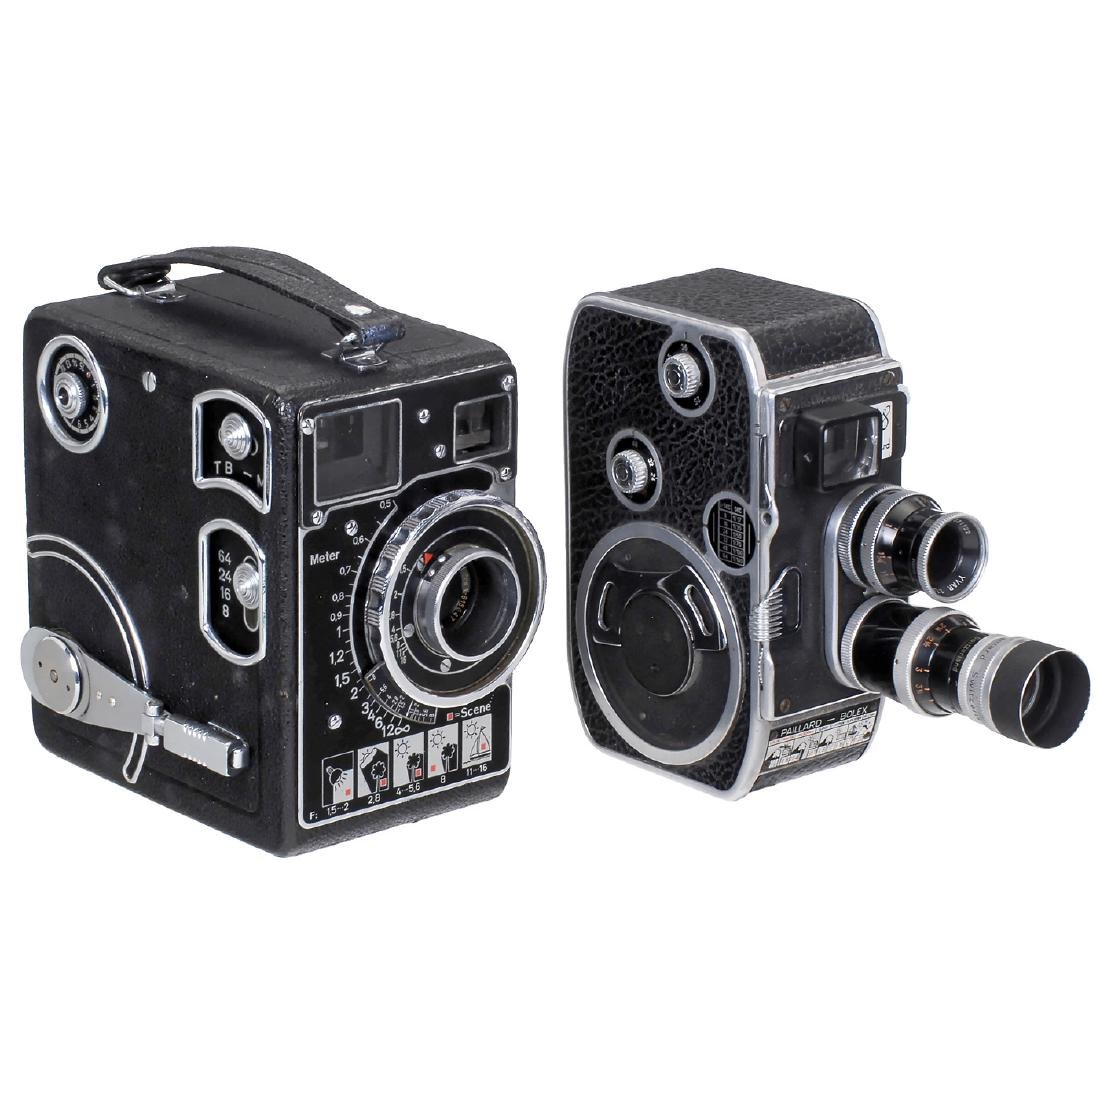 Siemens CII 16mm Movie Camera, c. 1940